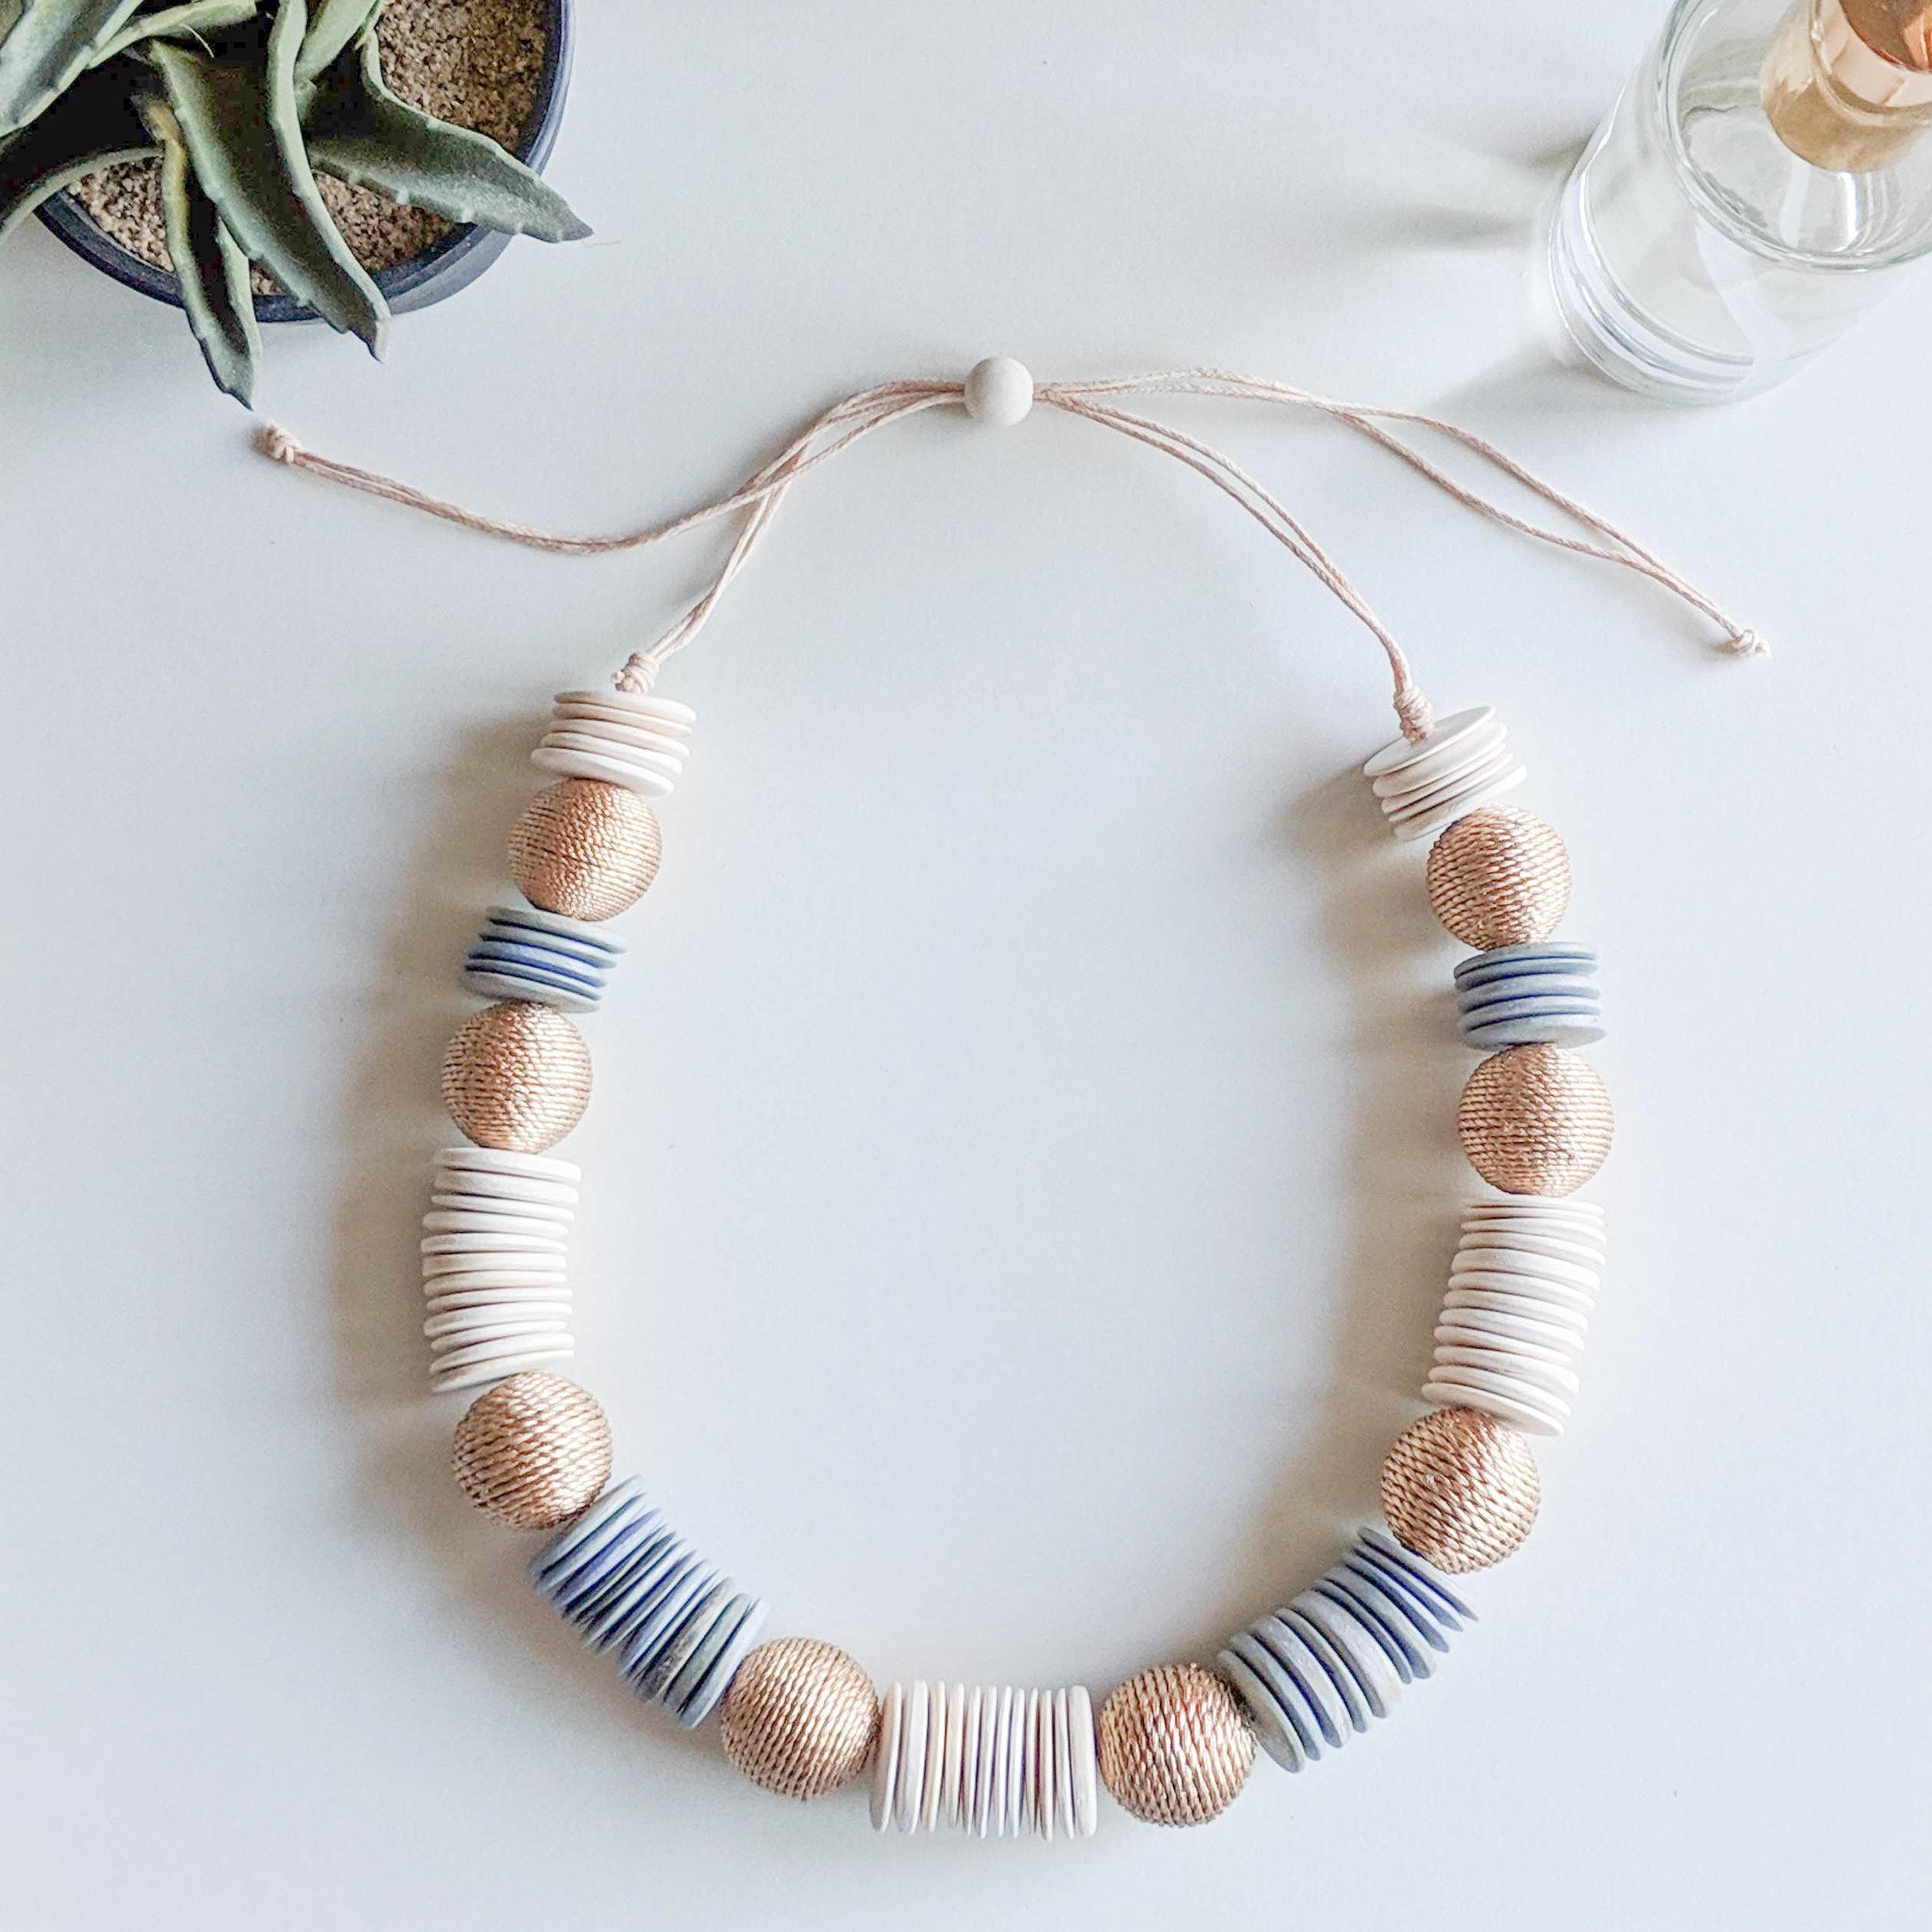 Wooden Jewelry.jpg